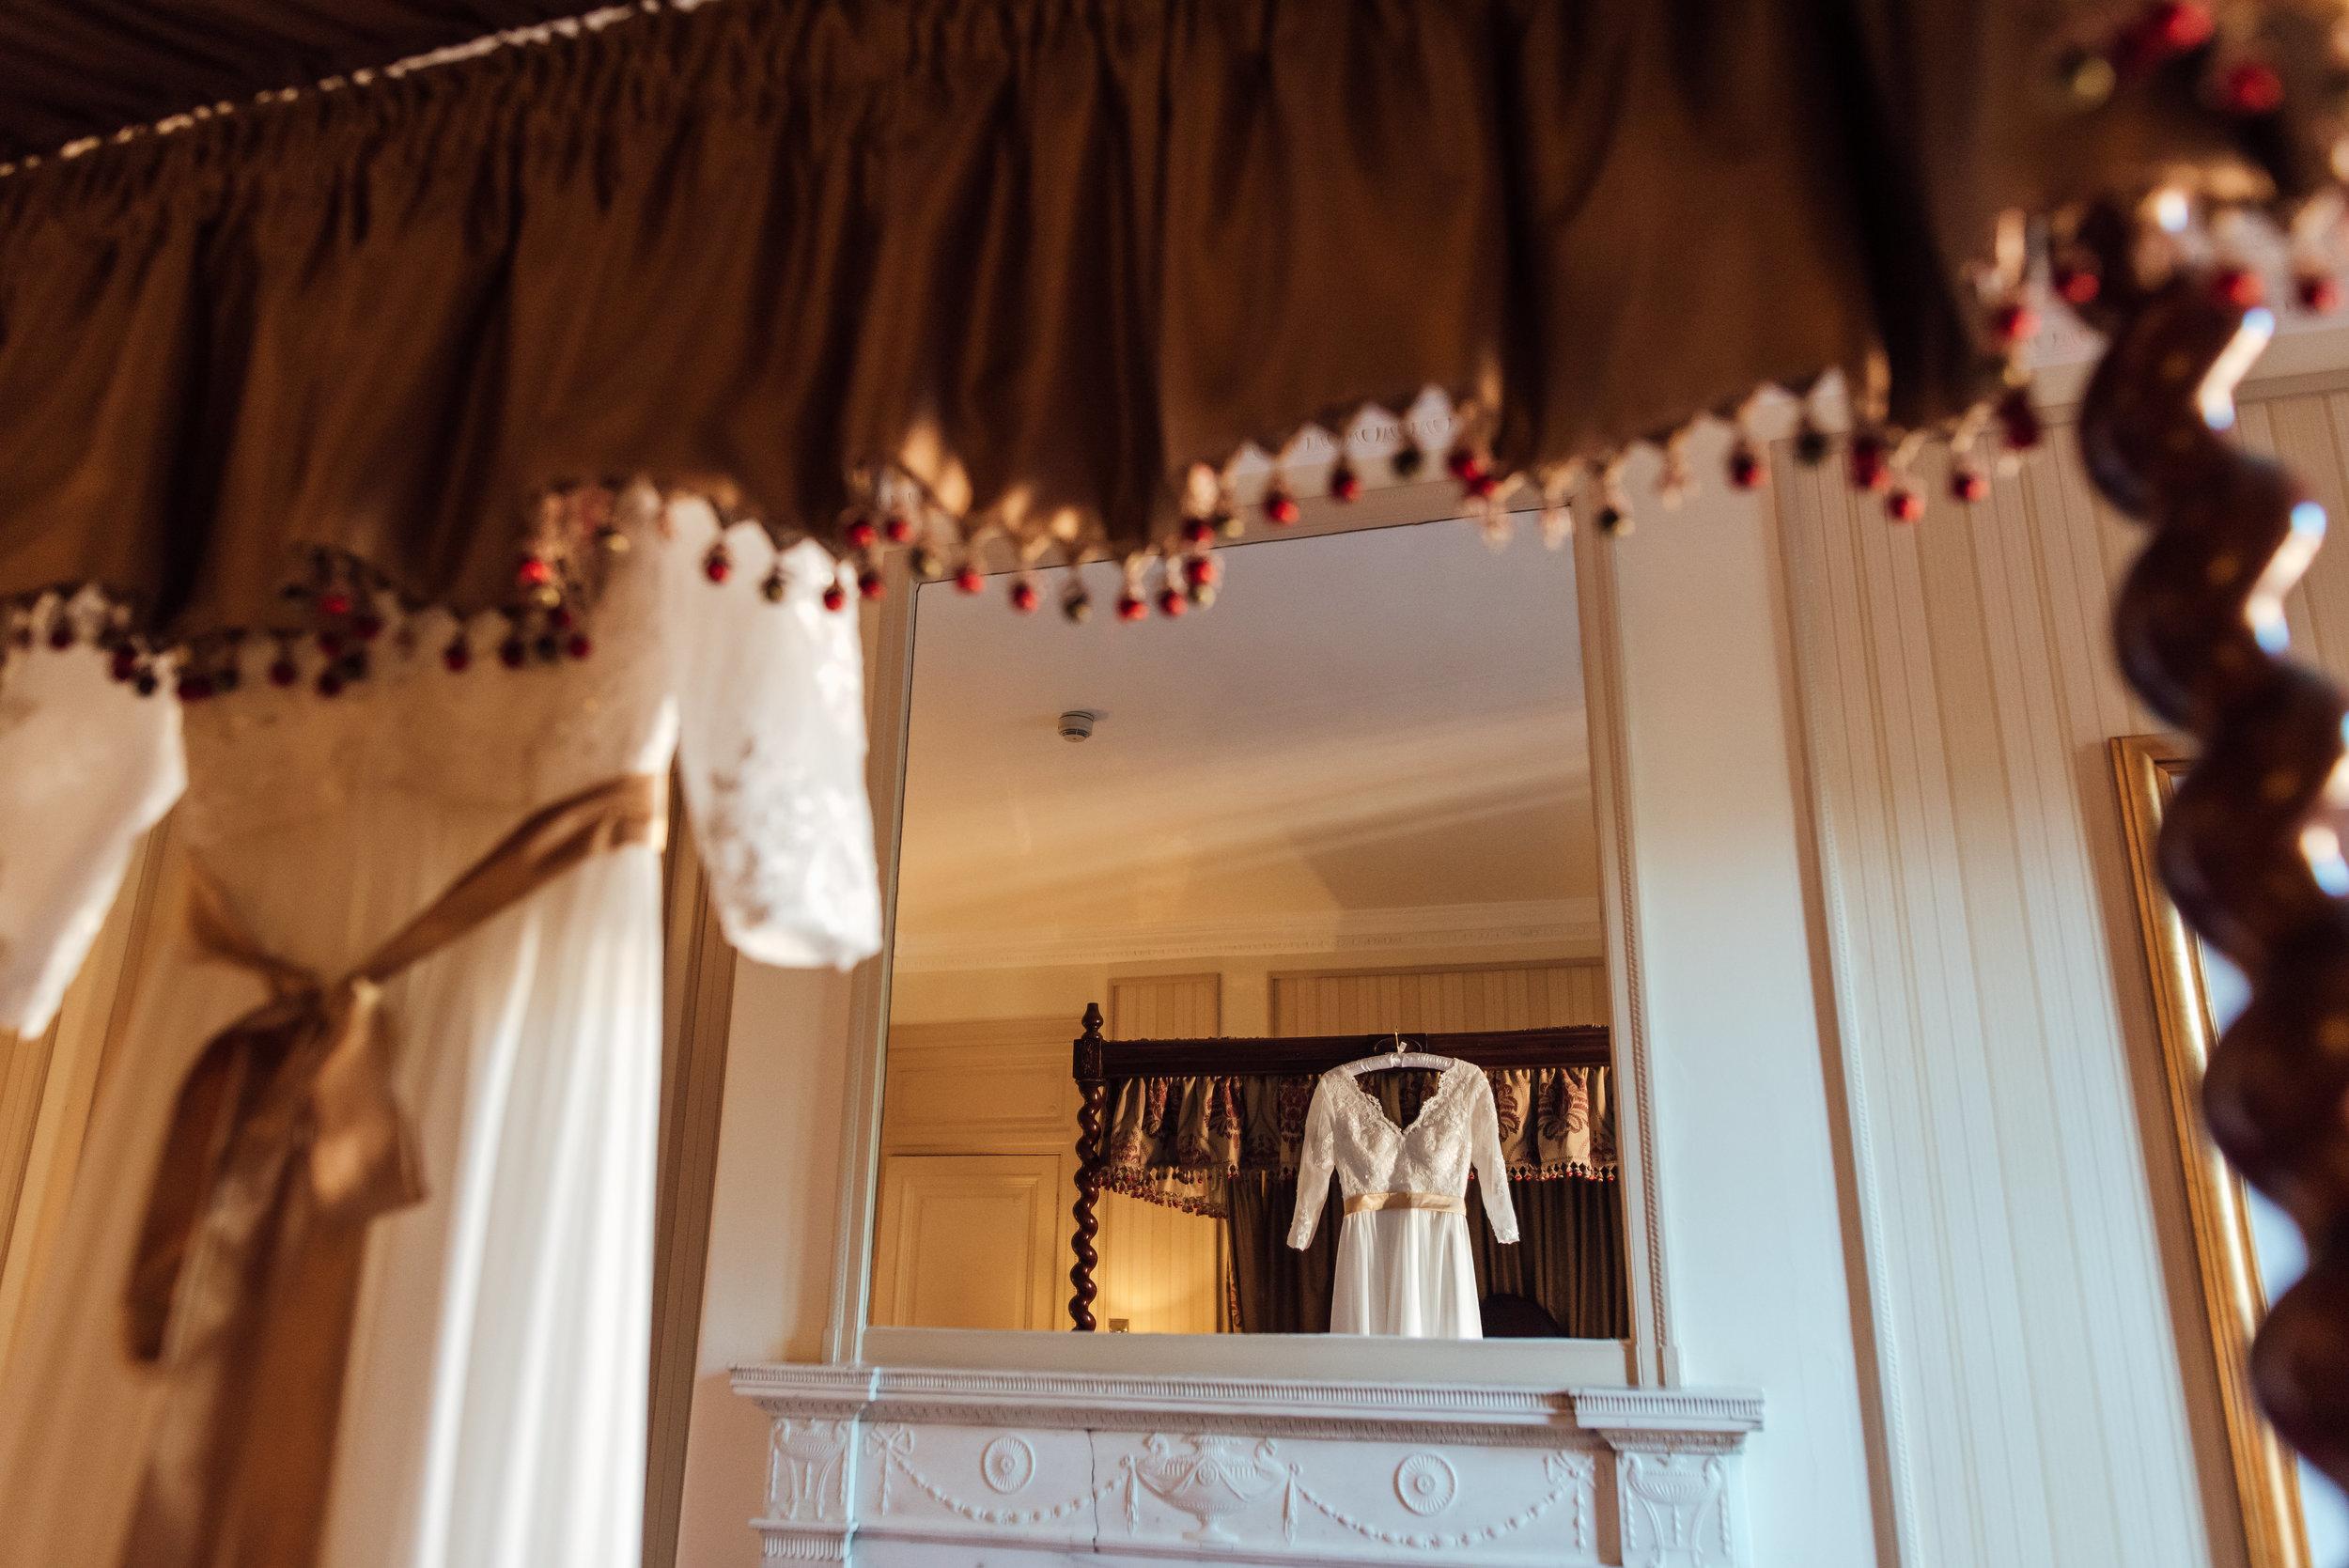 Hampshire-wedding-photographer-hampshire : Amy-James-Photography : Tylney-Hall-Wedding : Tyleny-Hall-Wedding-Photographer : Hampshire-wedding-venue : Fleet-wedding-photographer-farnborough-103.jpg